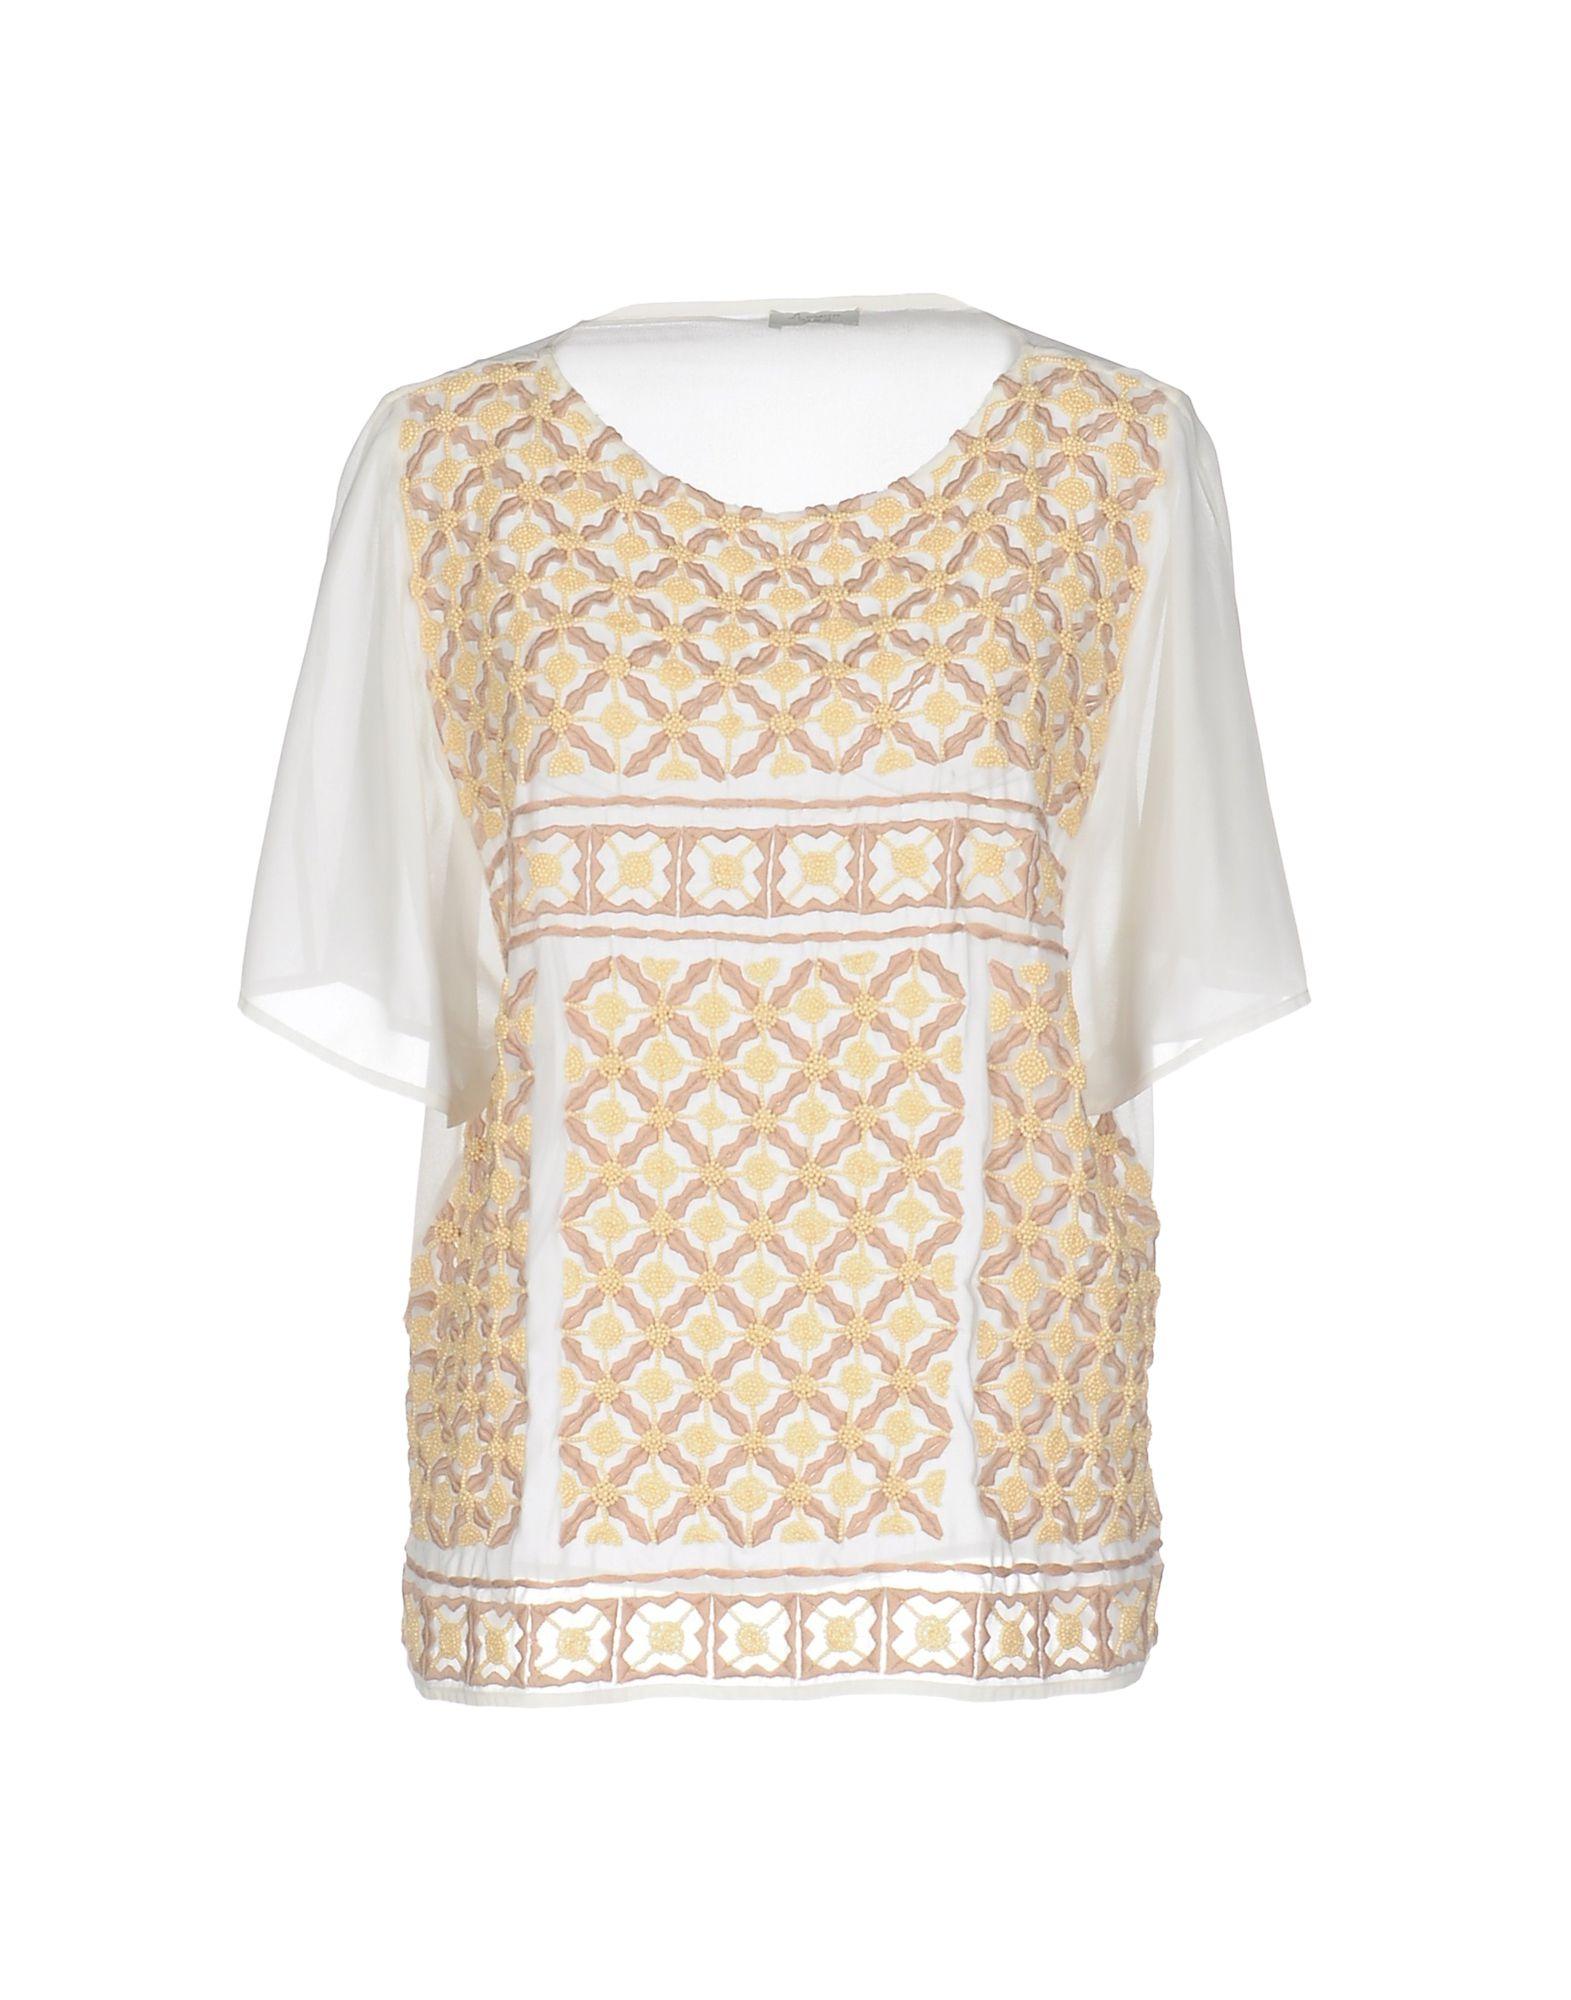 LE RAGAZZE DI ST. BARTH Блузка free in st barth повседневные шорты